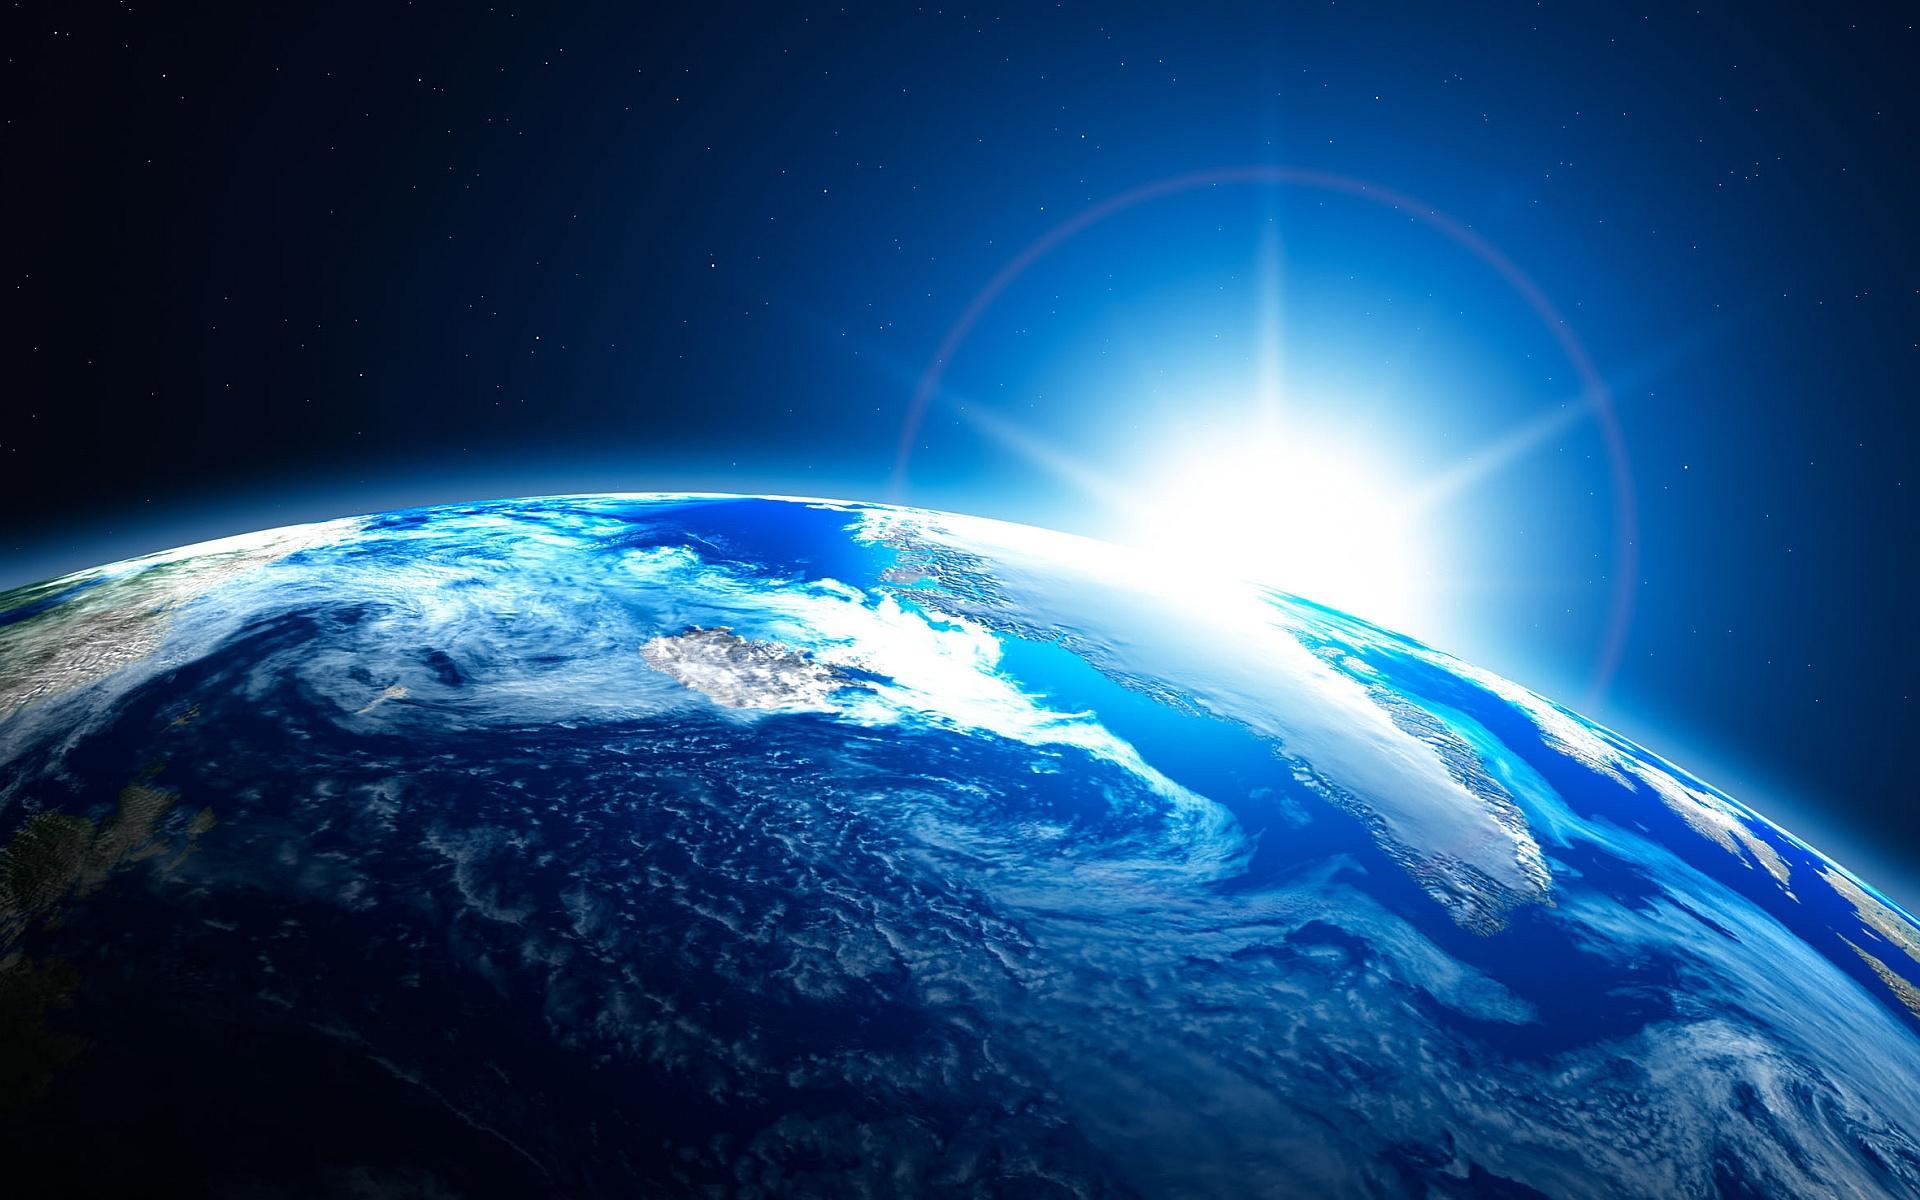 44 Planet Earth Wallpapers For Desktop On Wallpapersafari